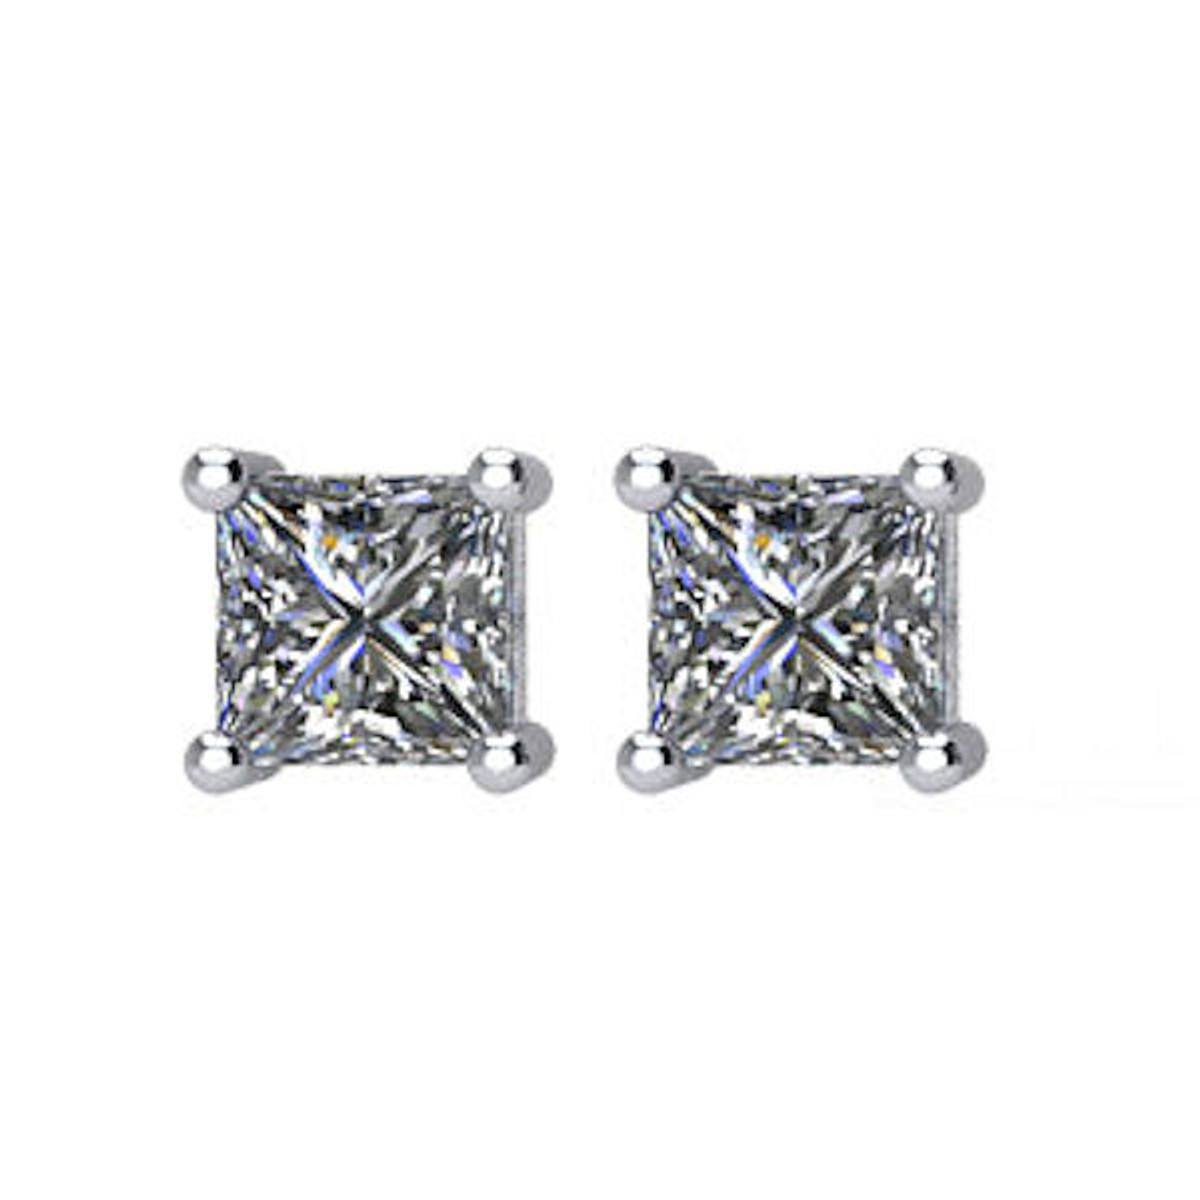 1/4 CT TW Princess Cut Diamond Stud Earrings